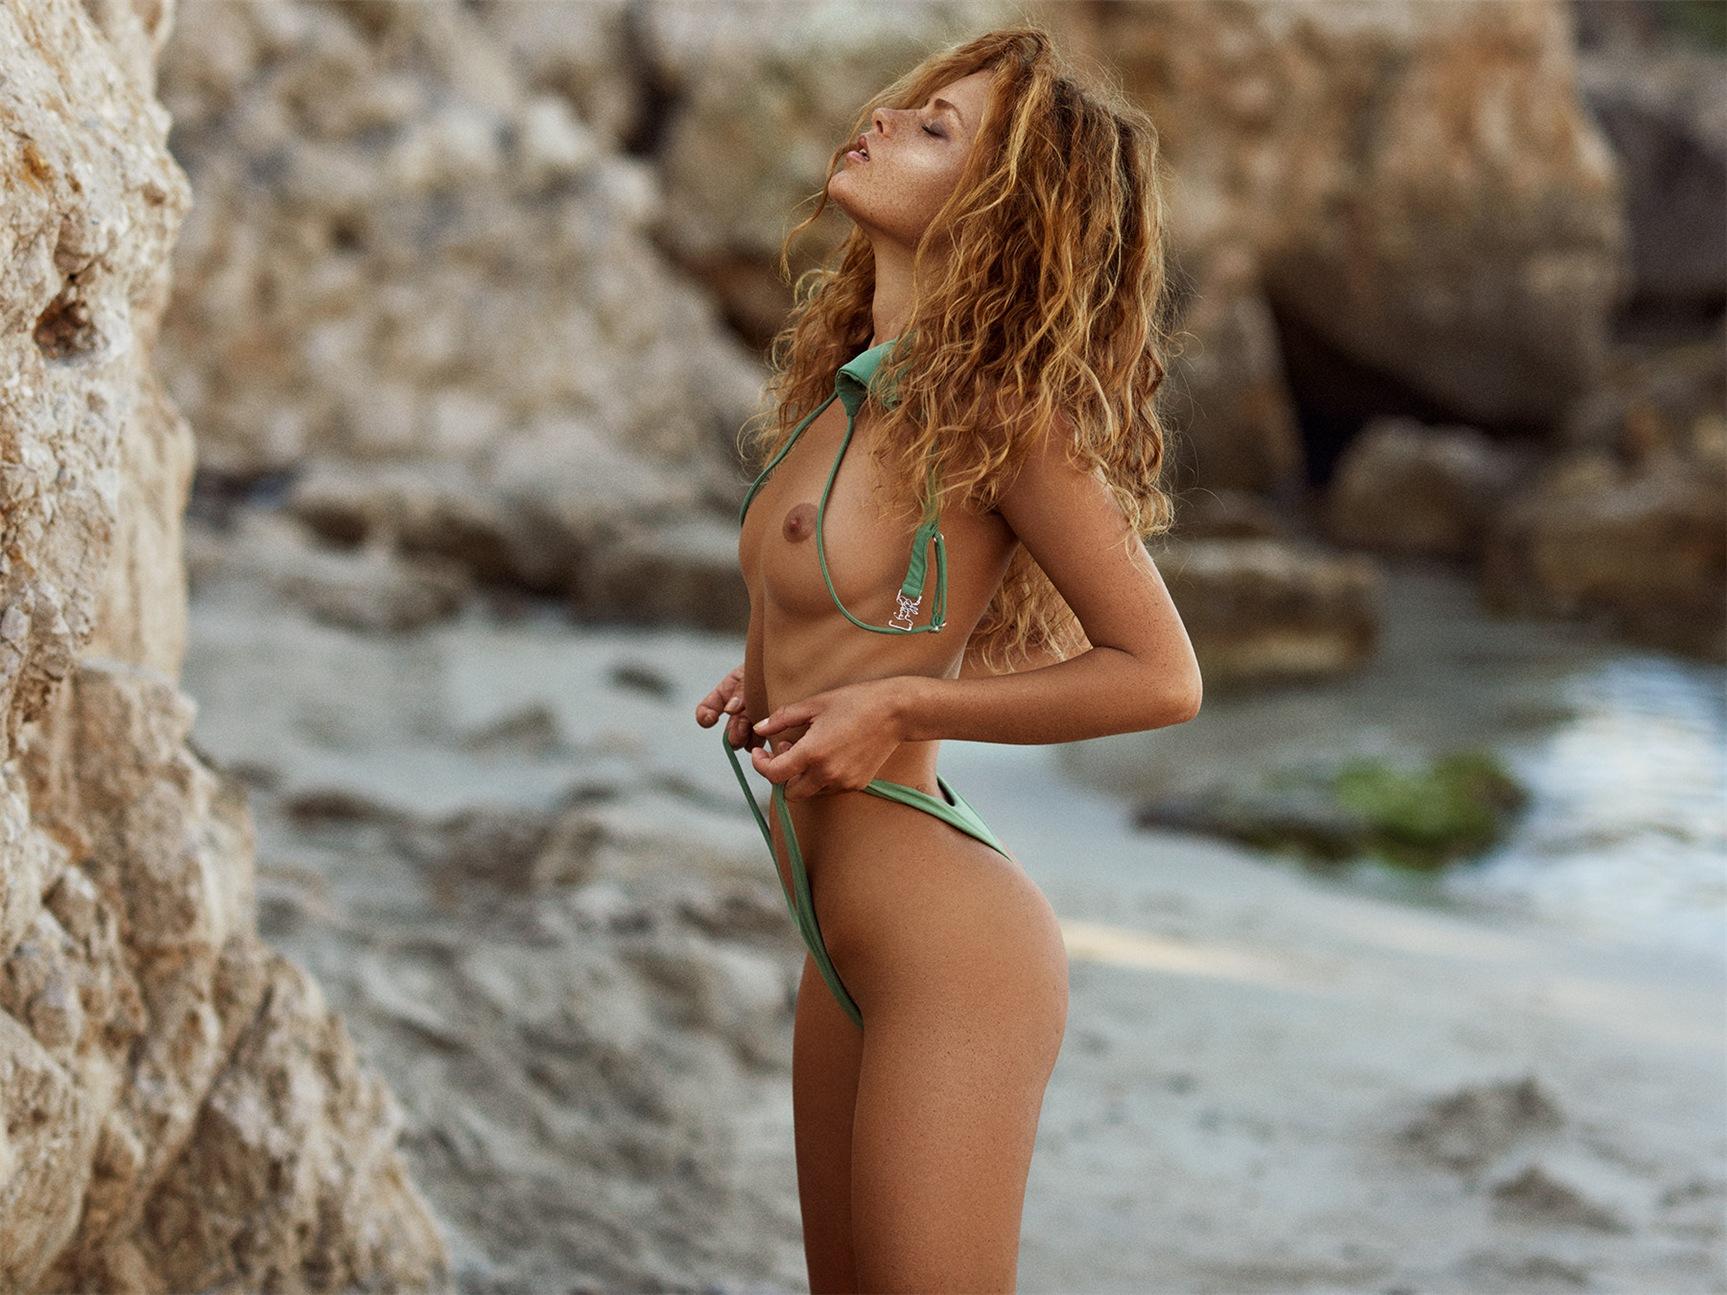 Юлия Ярошенко / Julia Yaroshenko nude by Joakim Karlsson